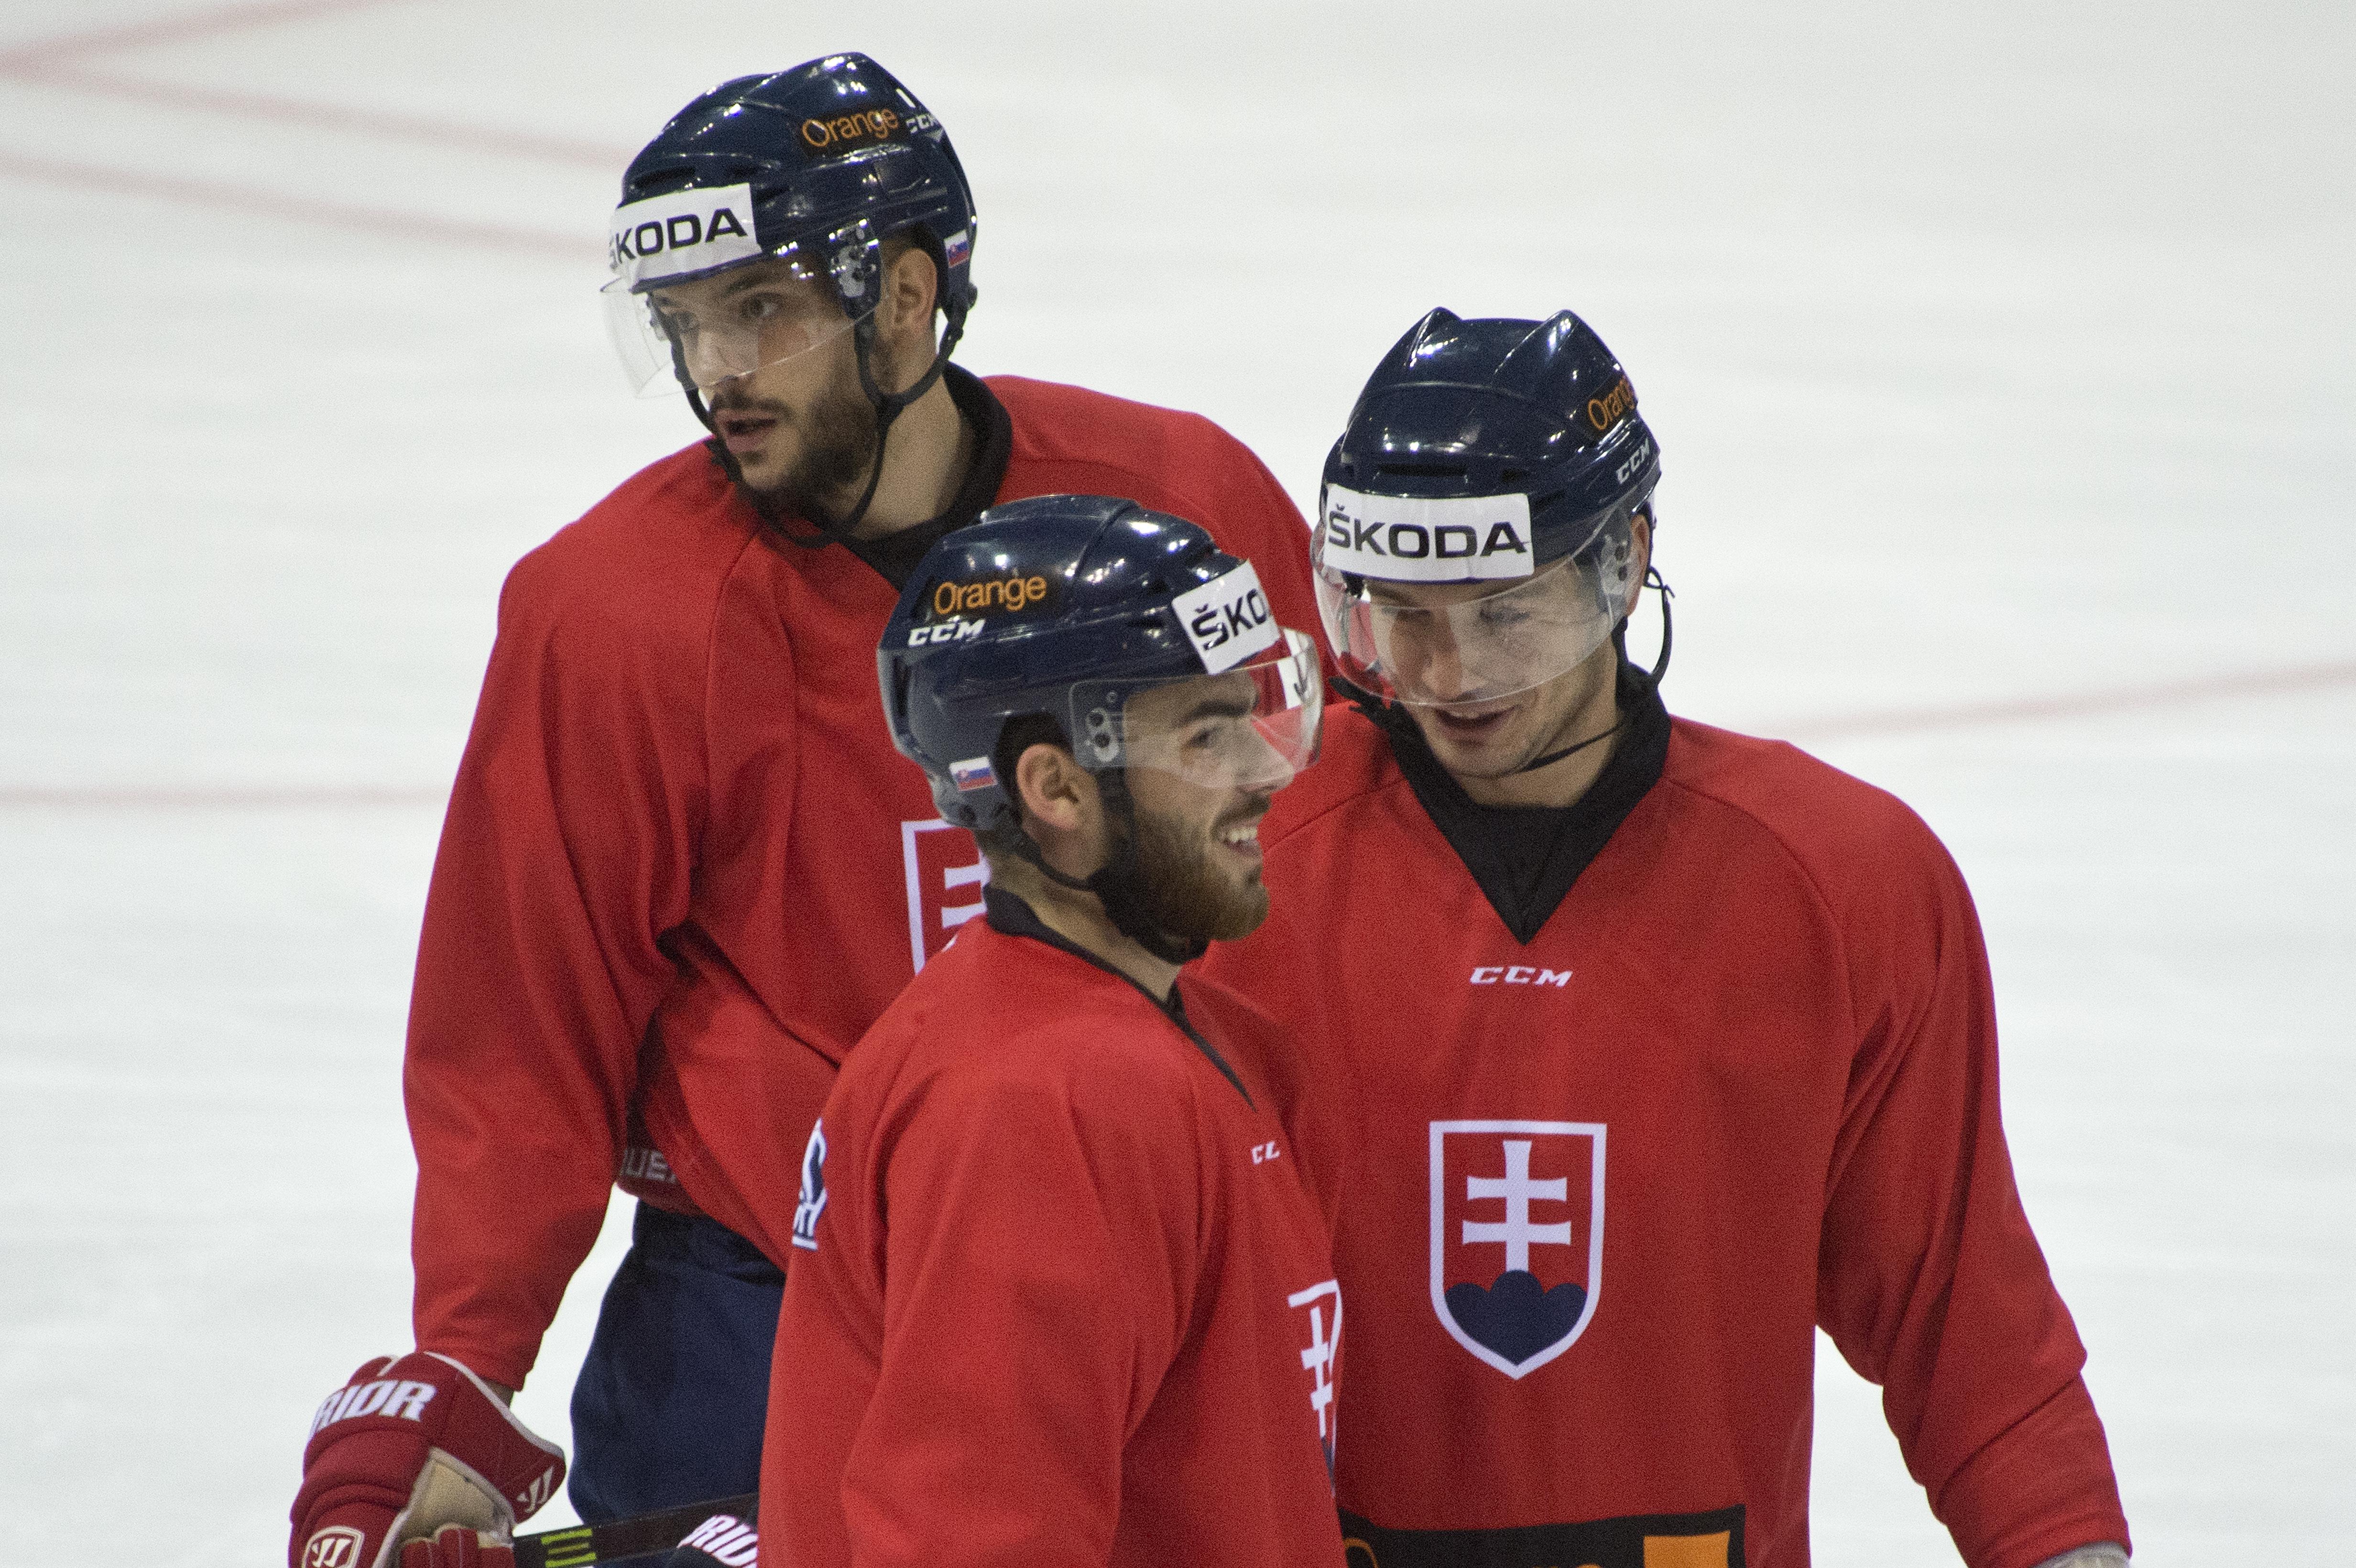 20141105_hokej6197551.jpg